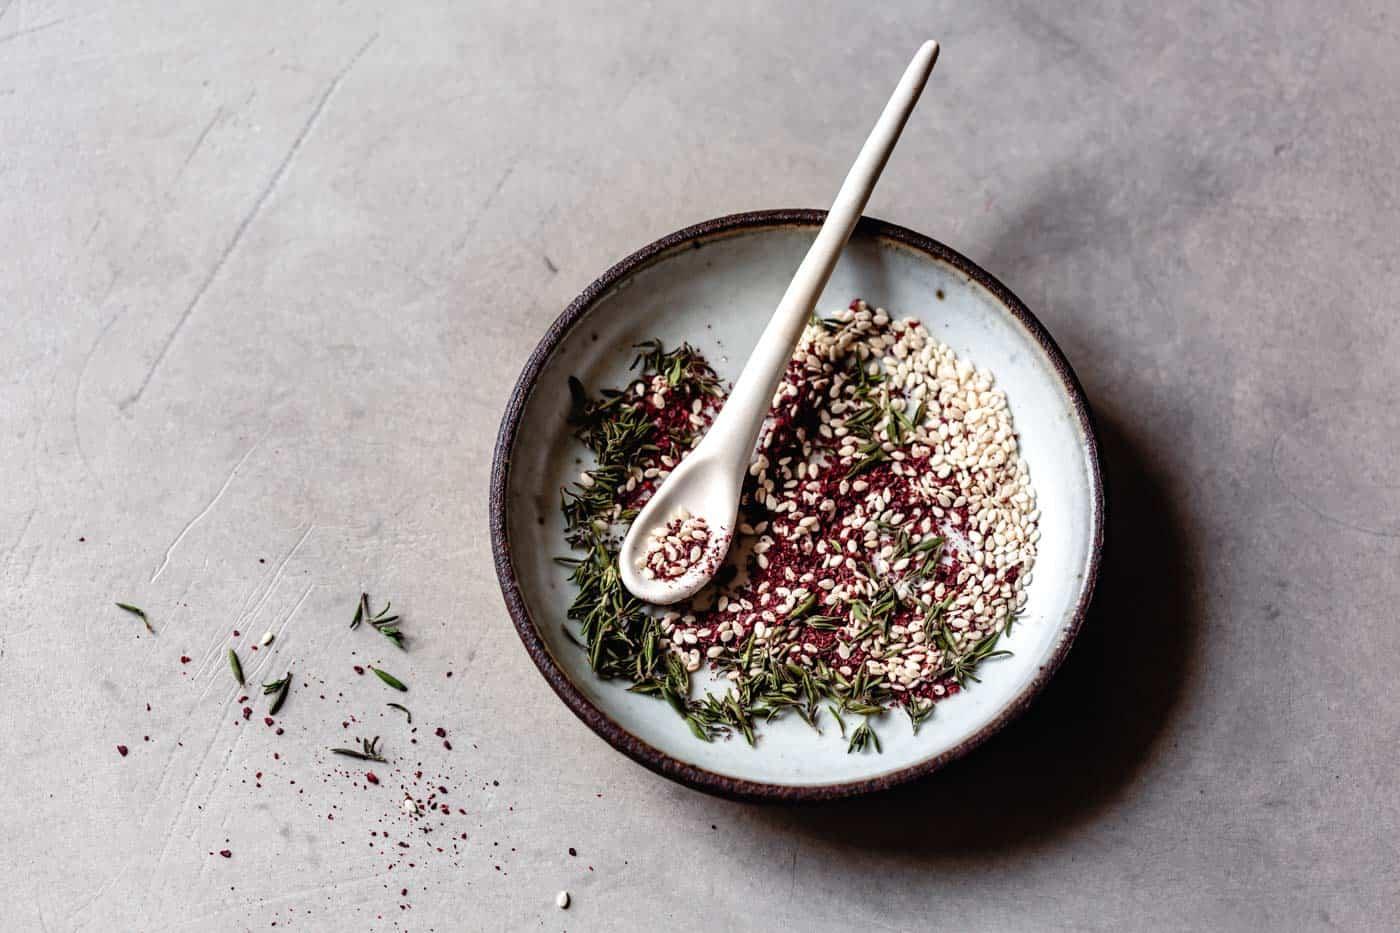 Stirring za'atar in a bowl